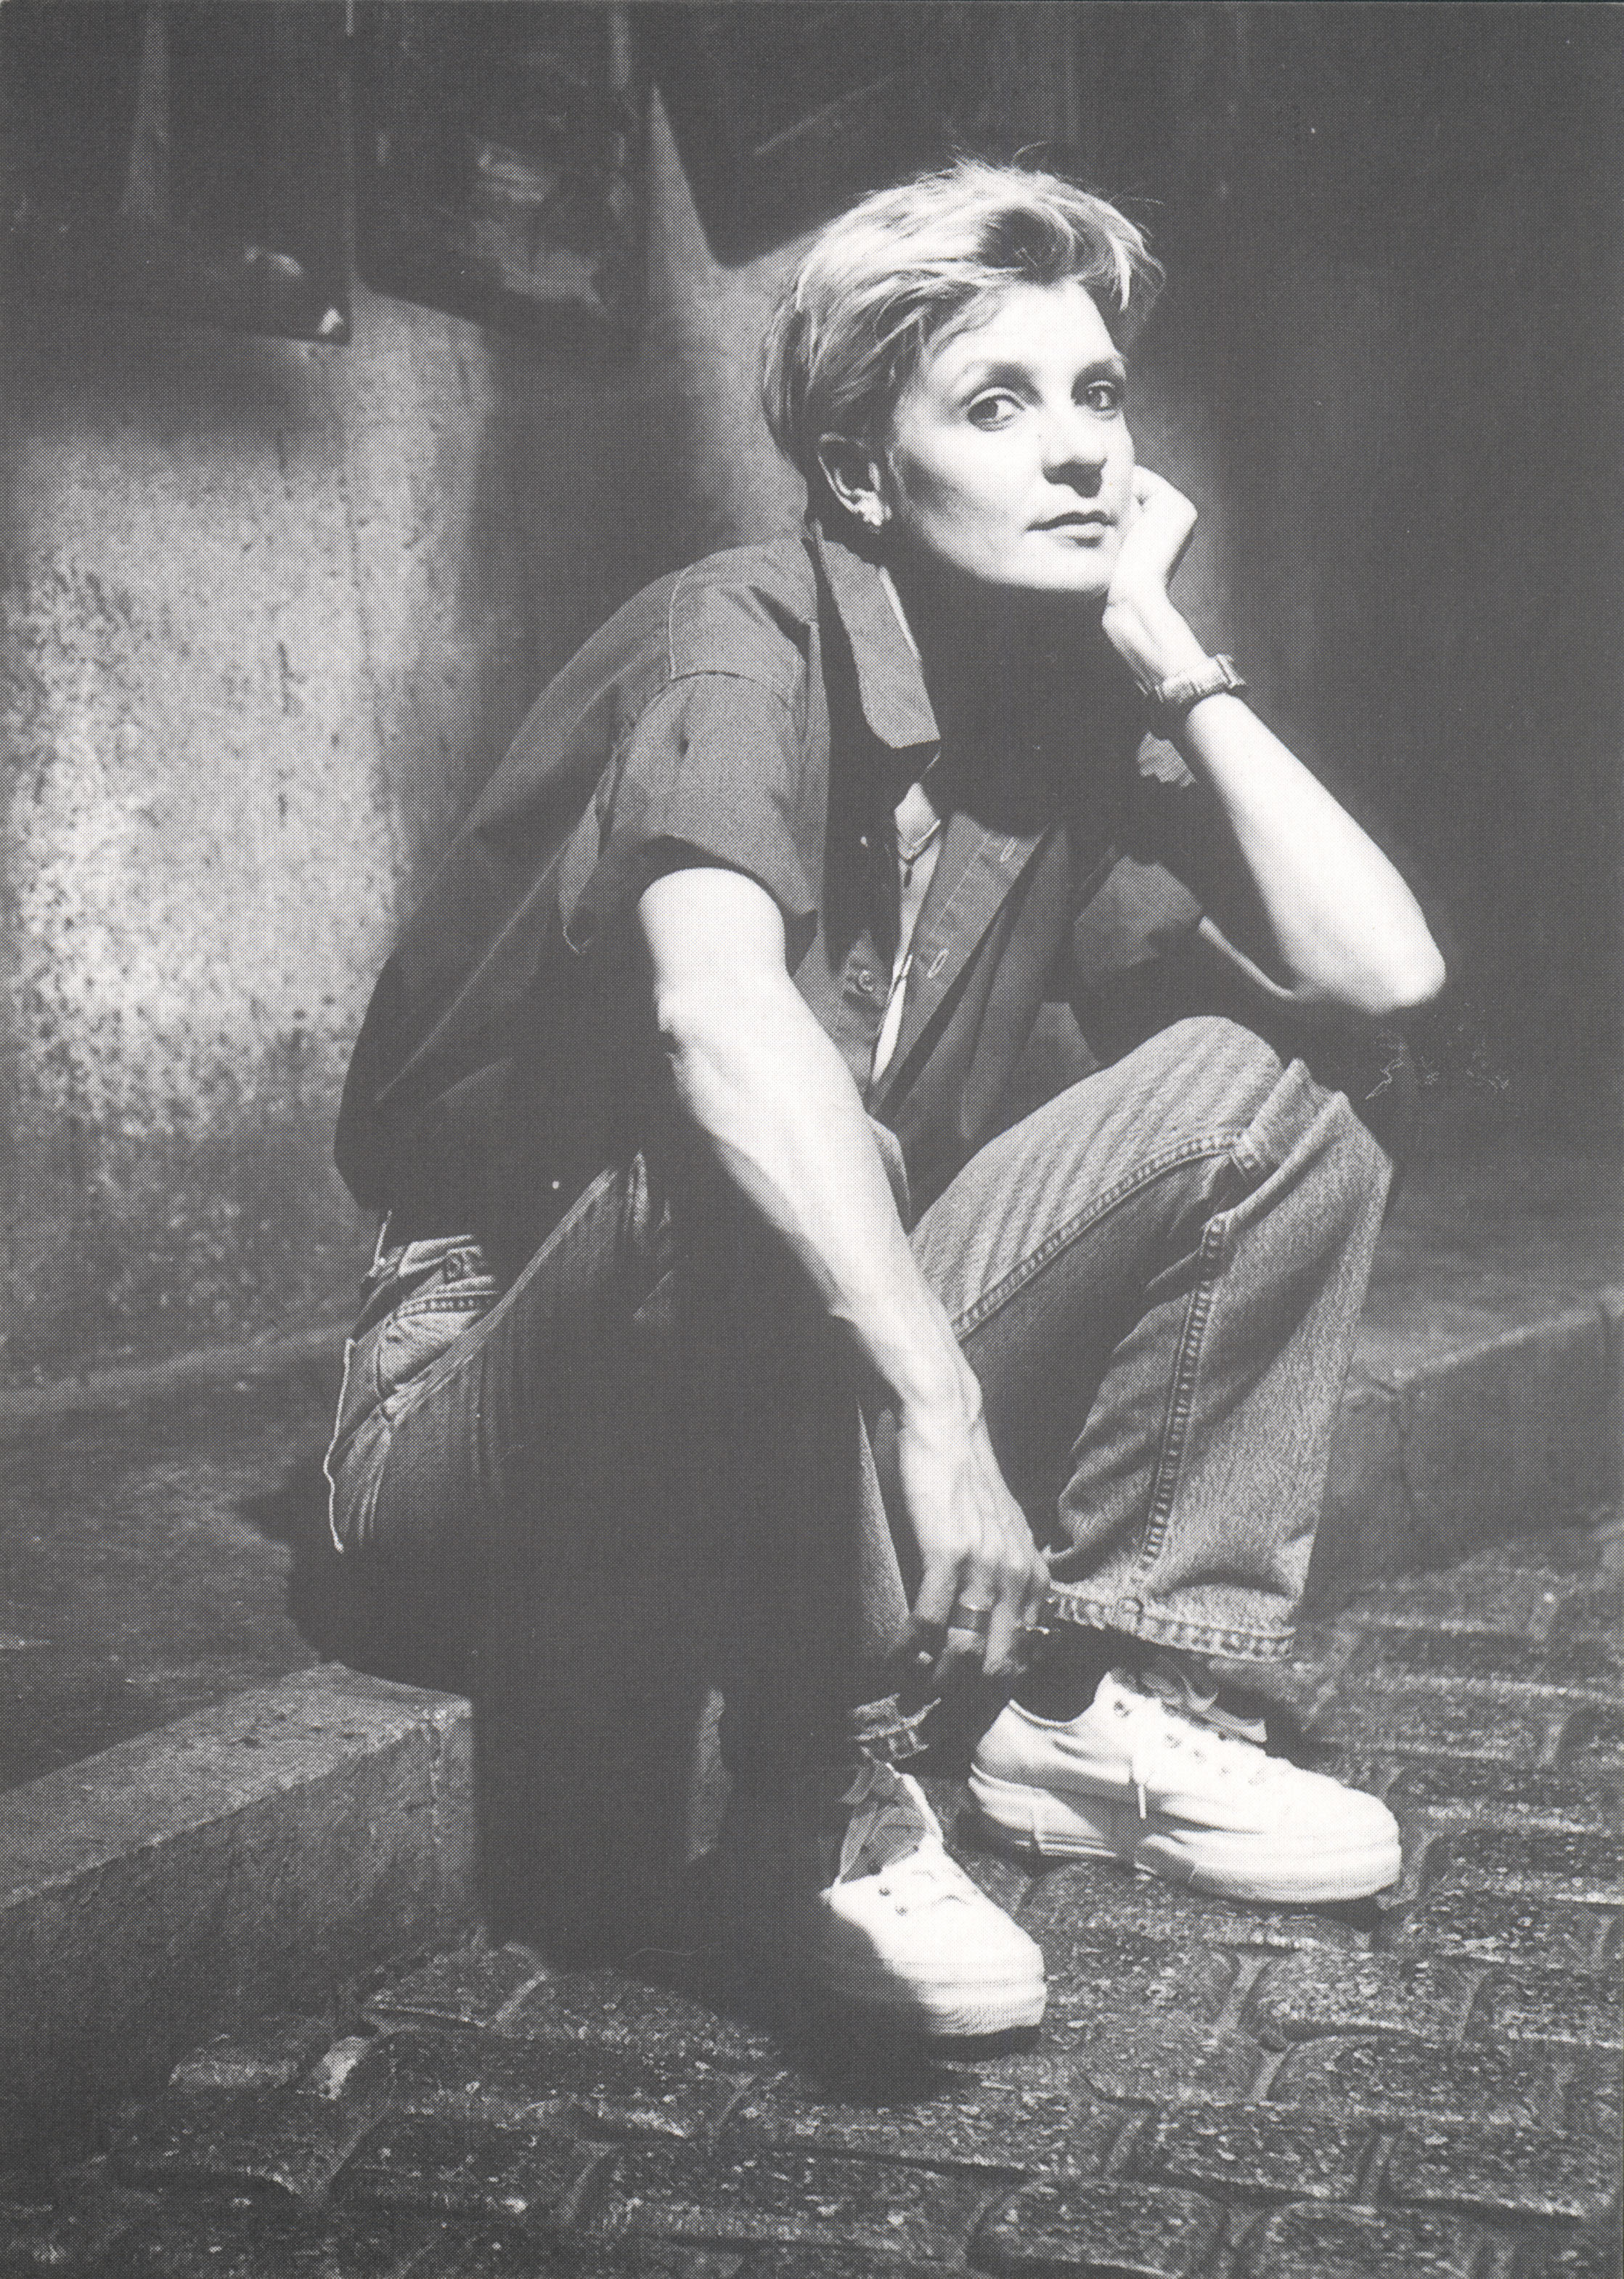 ausstellung 1996 Gesichter hinter der Kamera. Porträts hessischer FilmemacherInnen